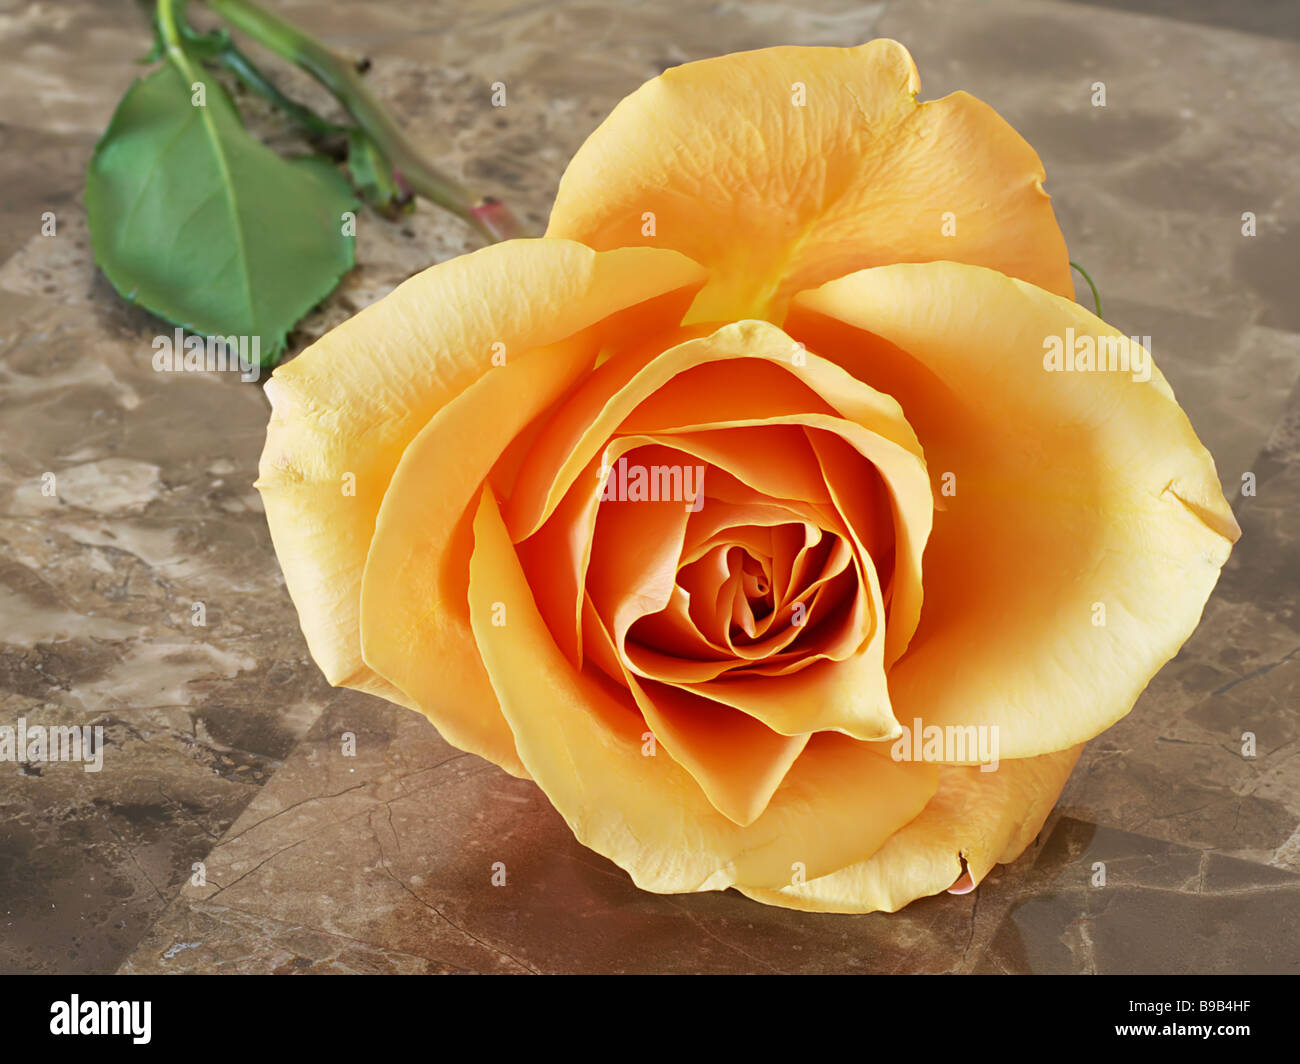 Rose Orange sur table fantaisie Photo Stock